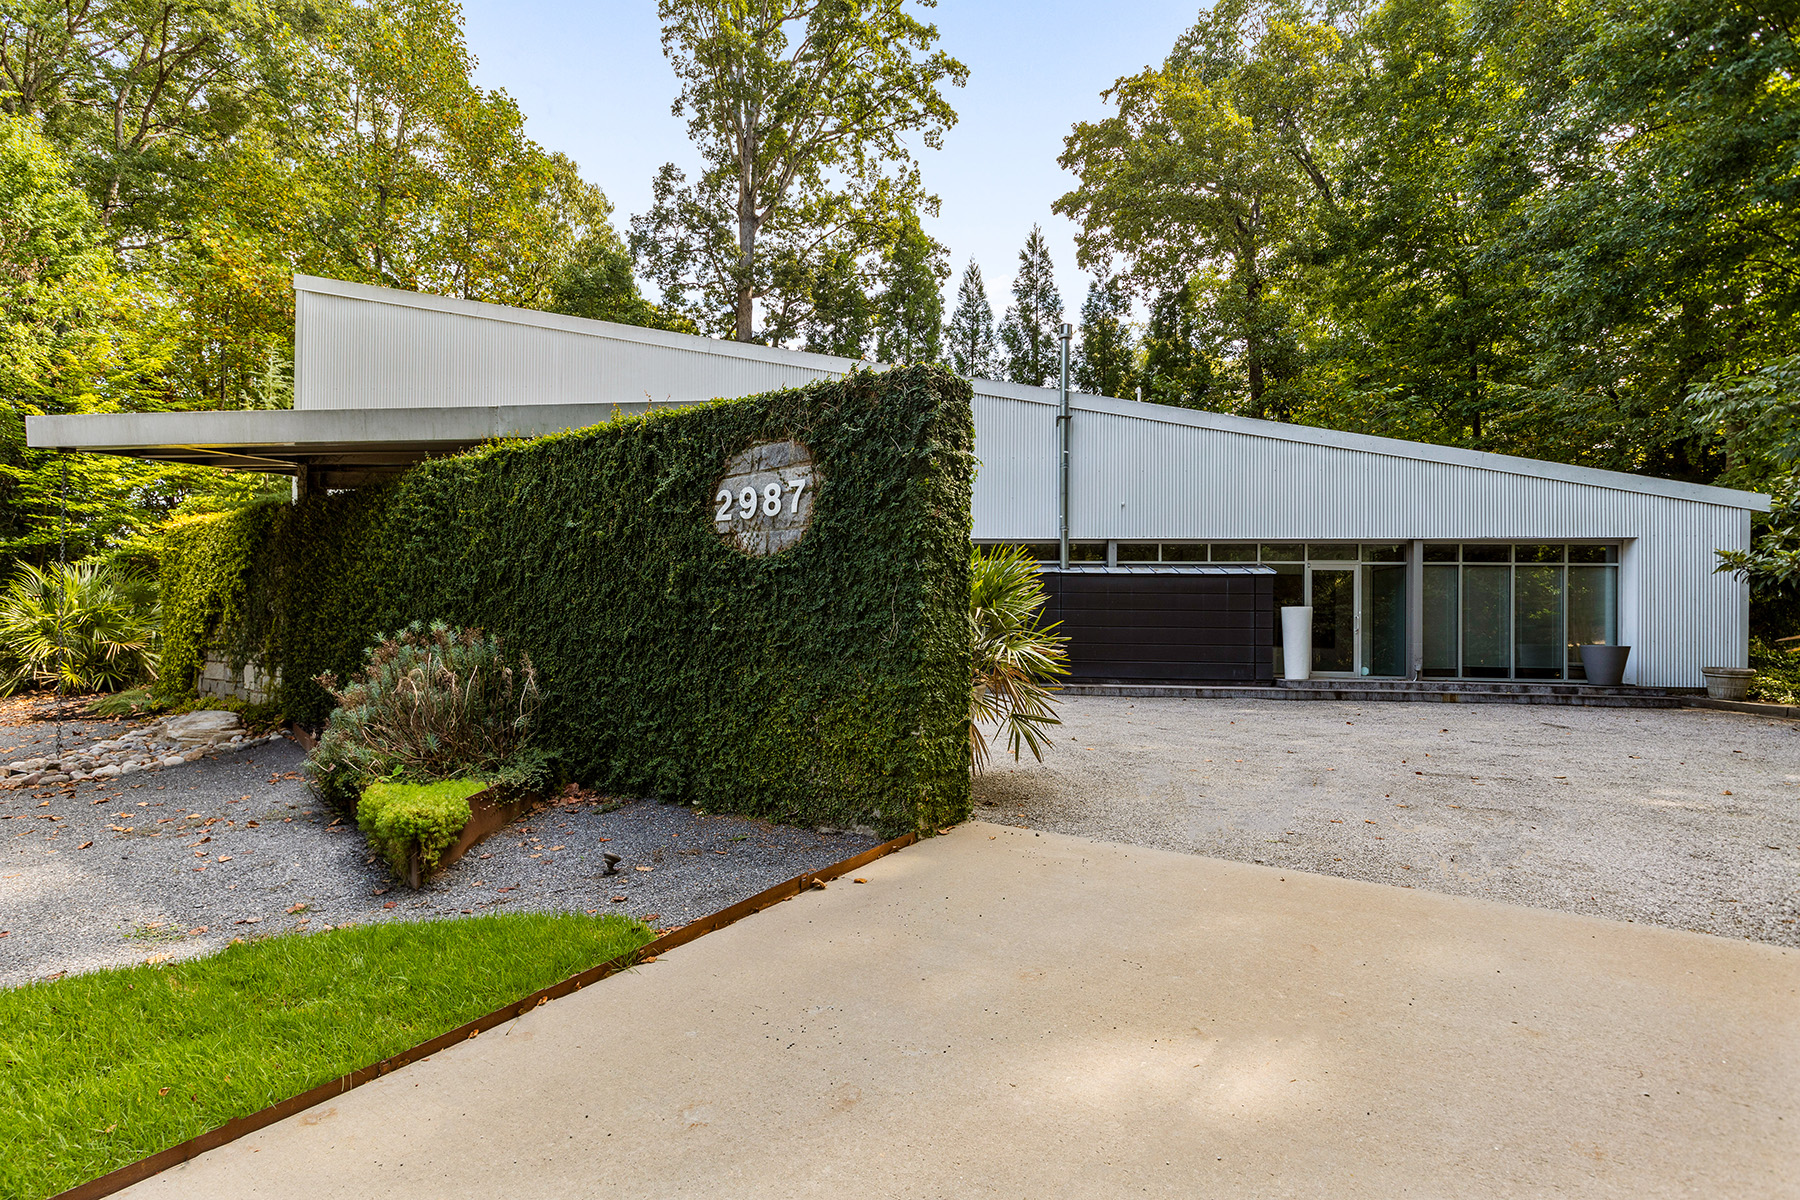 Single Family Homes для того Продажа на Cutting Edge Architecture Mixed With Natural Elements 2987 Northside Drive NW, Atlanta, Джорджия 30305 Соединенные Штаты